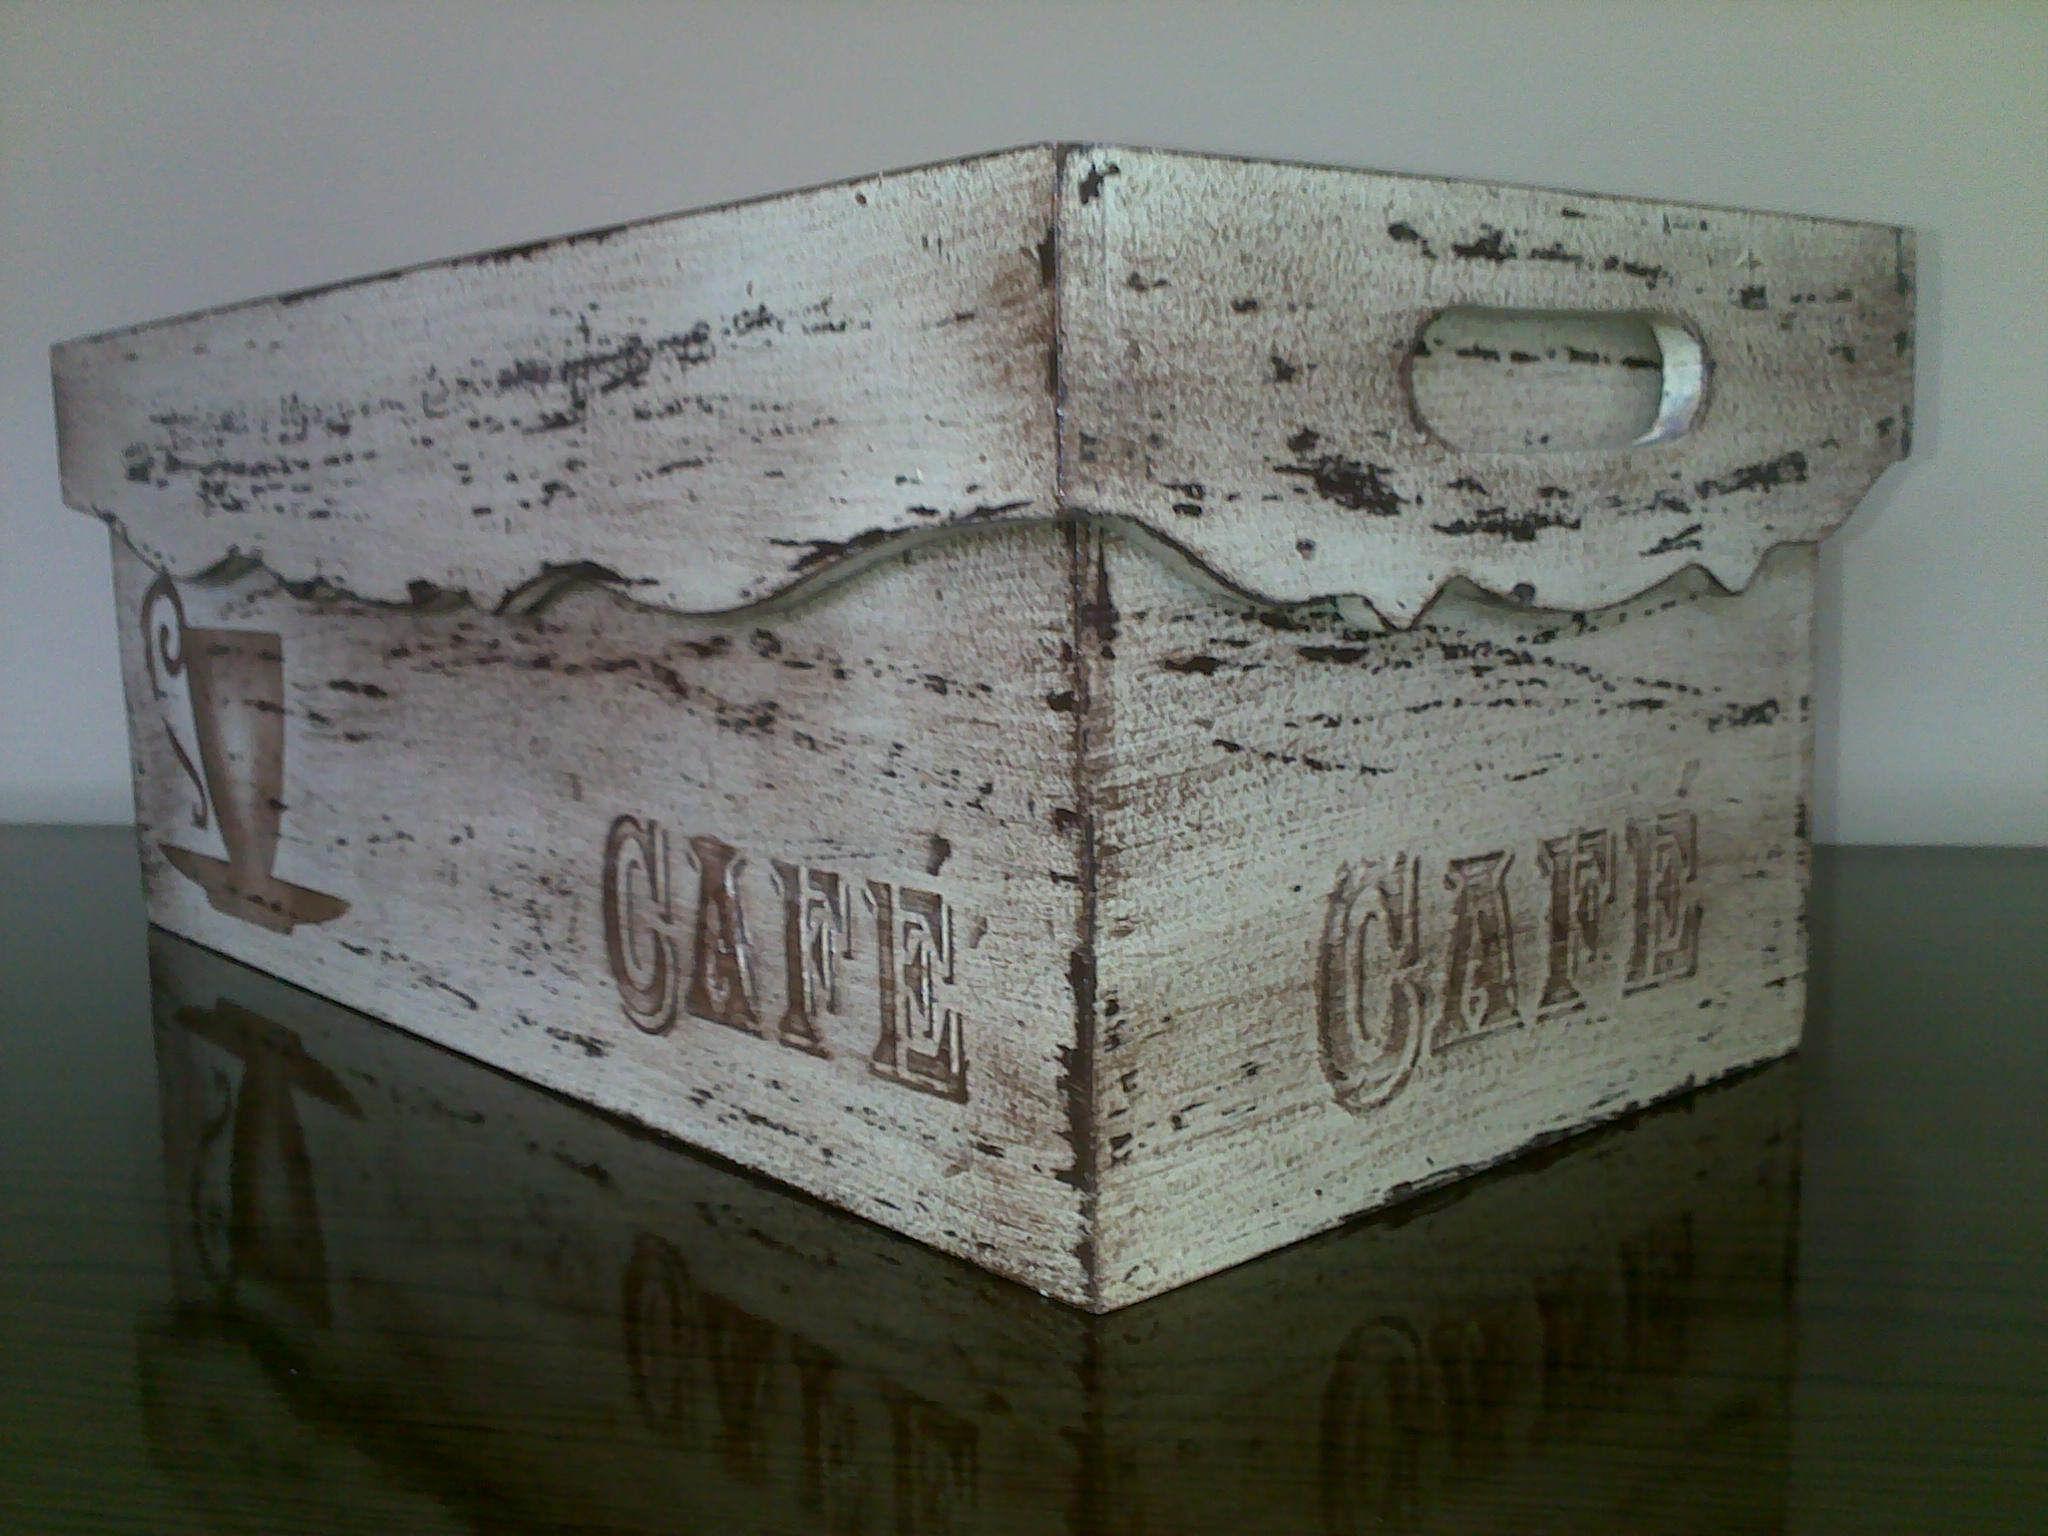 https://flic.kr/p/AkthLz | caixa para xícaras - tampa bandeja